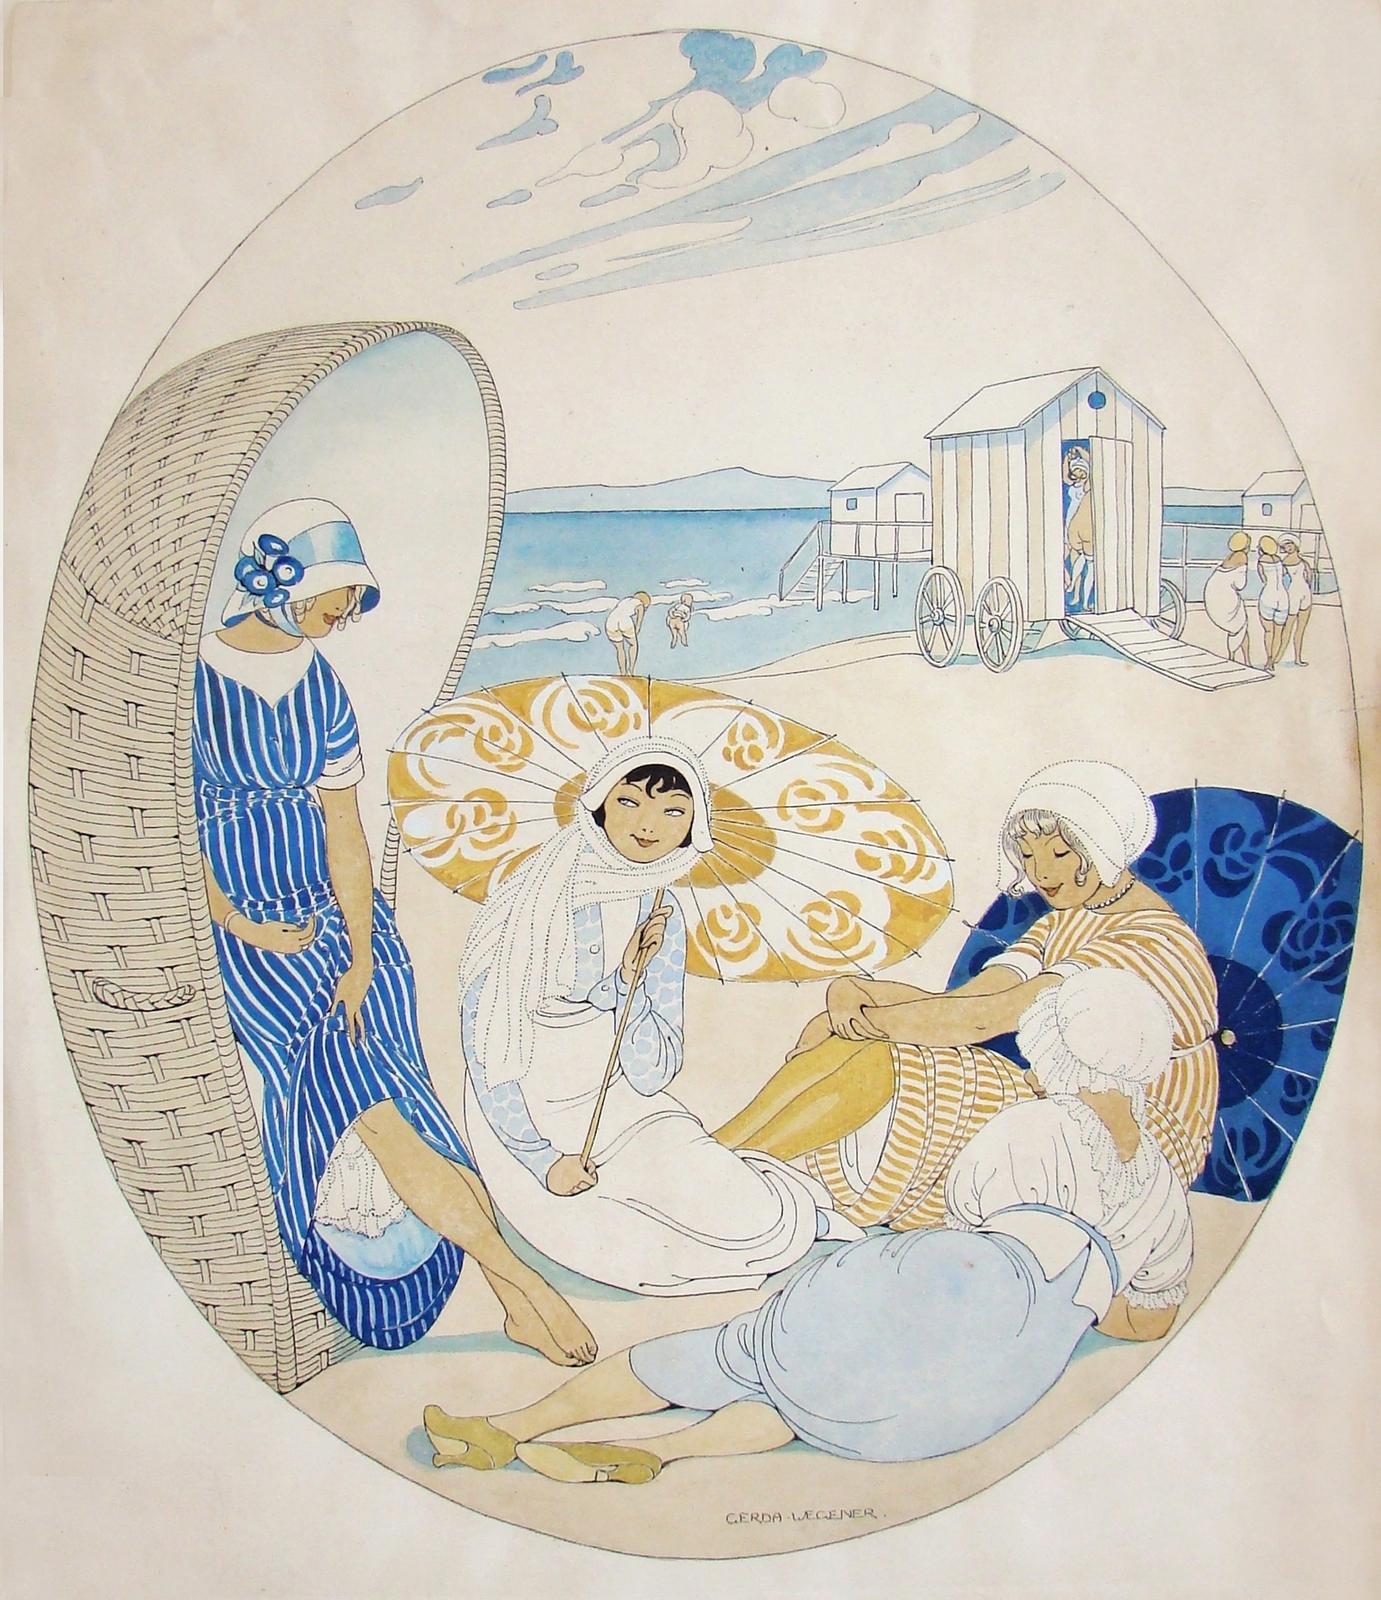 1913_Четыре женщины на пляже (Four Women at the Beach)_43.2 х 36.8_бумага, акварель_Частное собрание.jpg